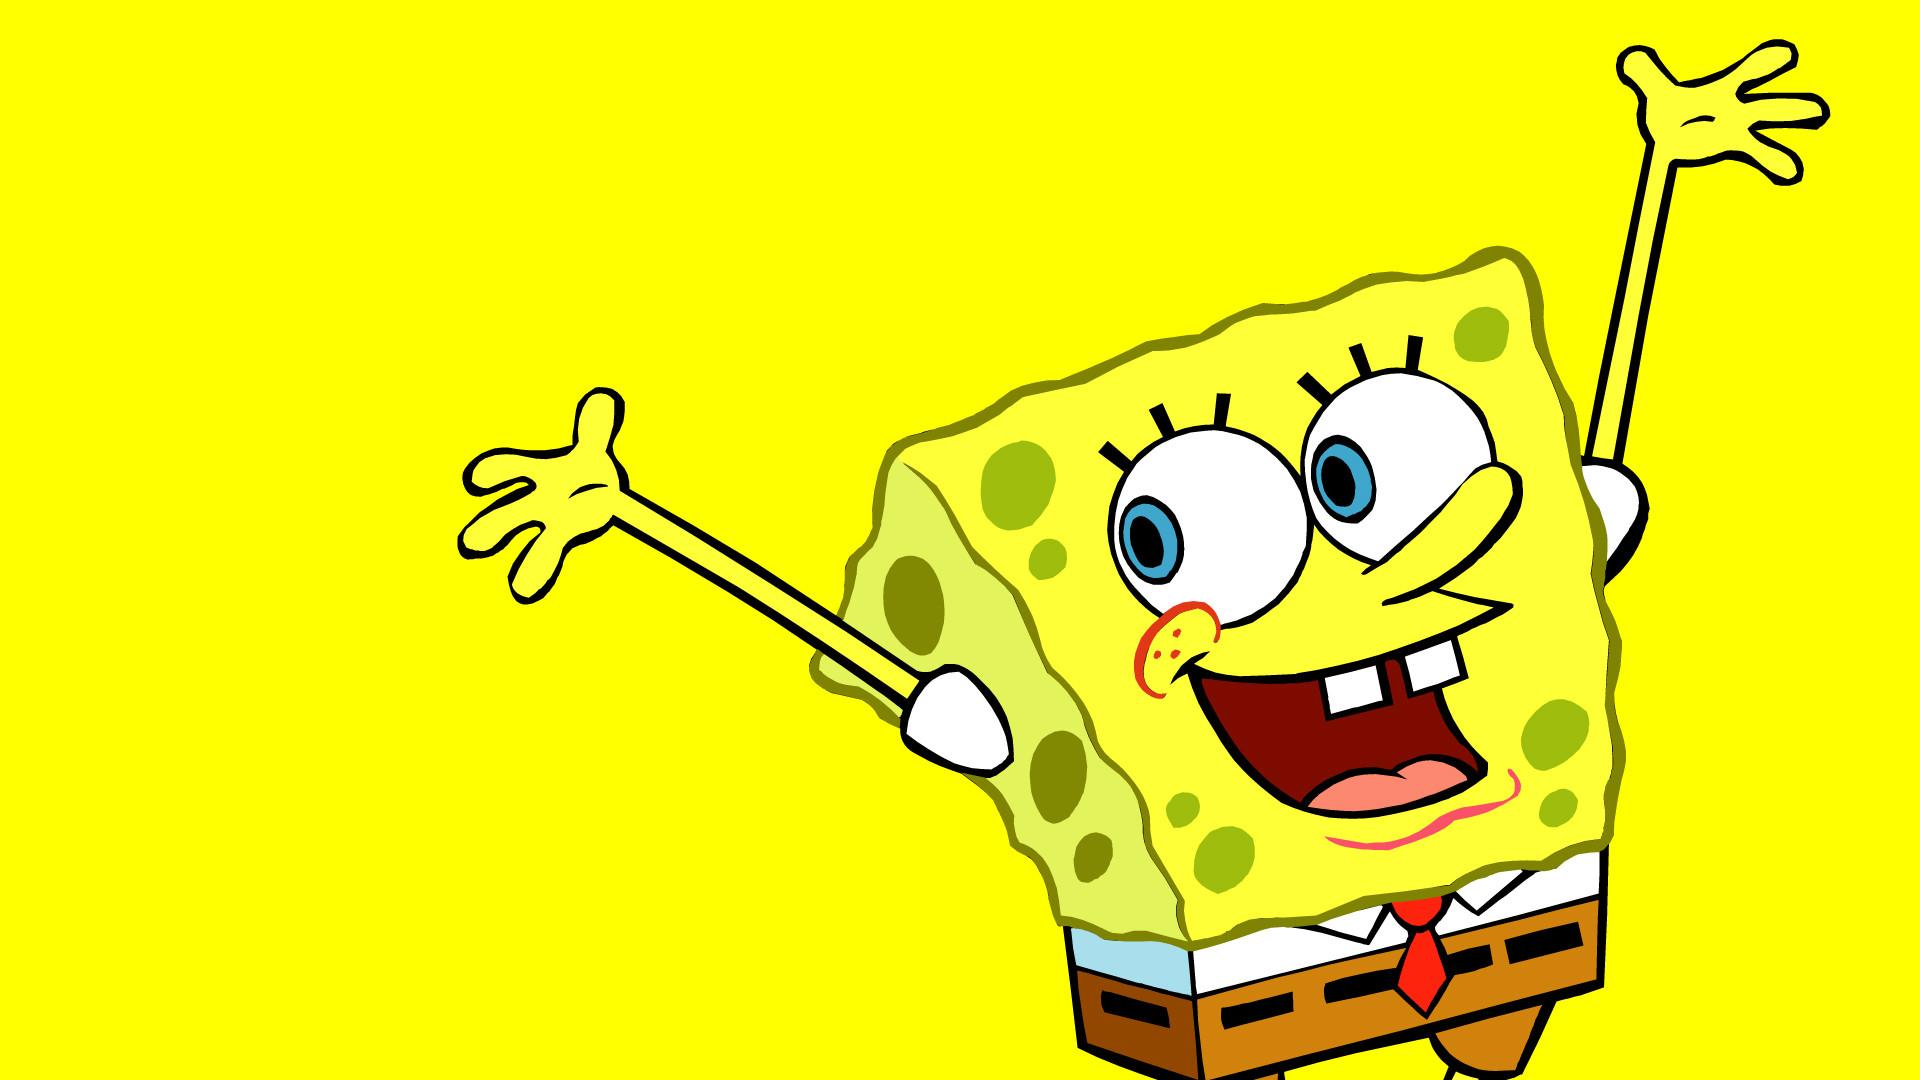 Spongebob And Patrick Wallpaper 70 Images